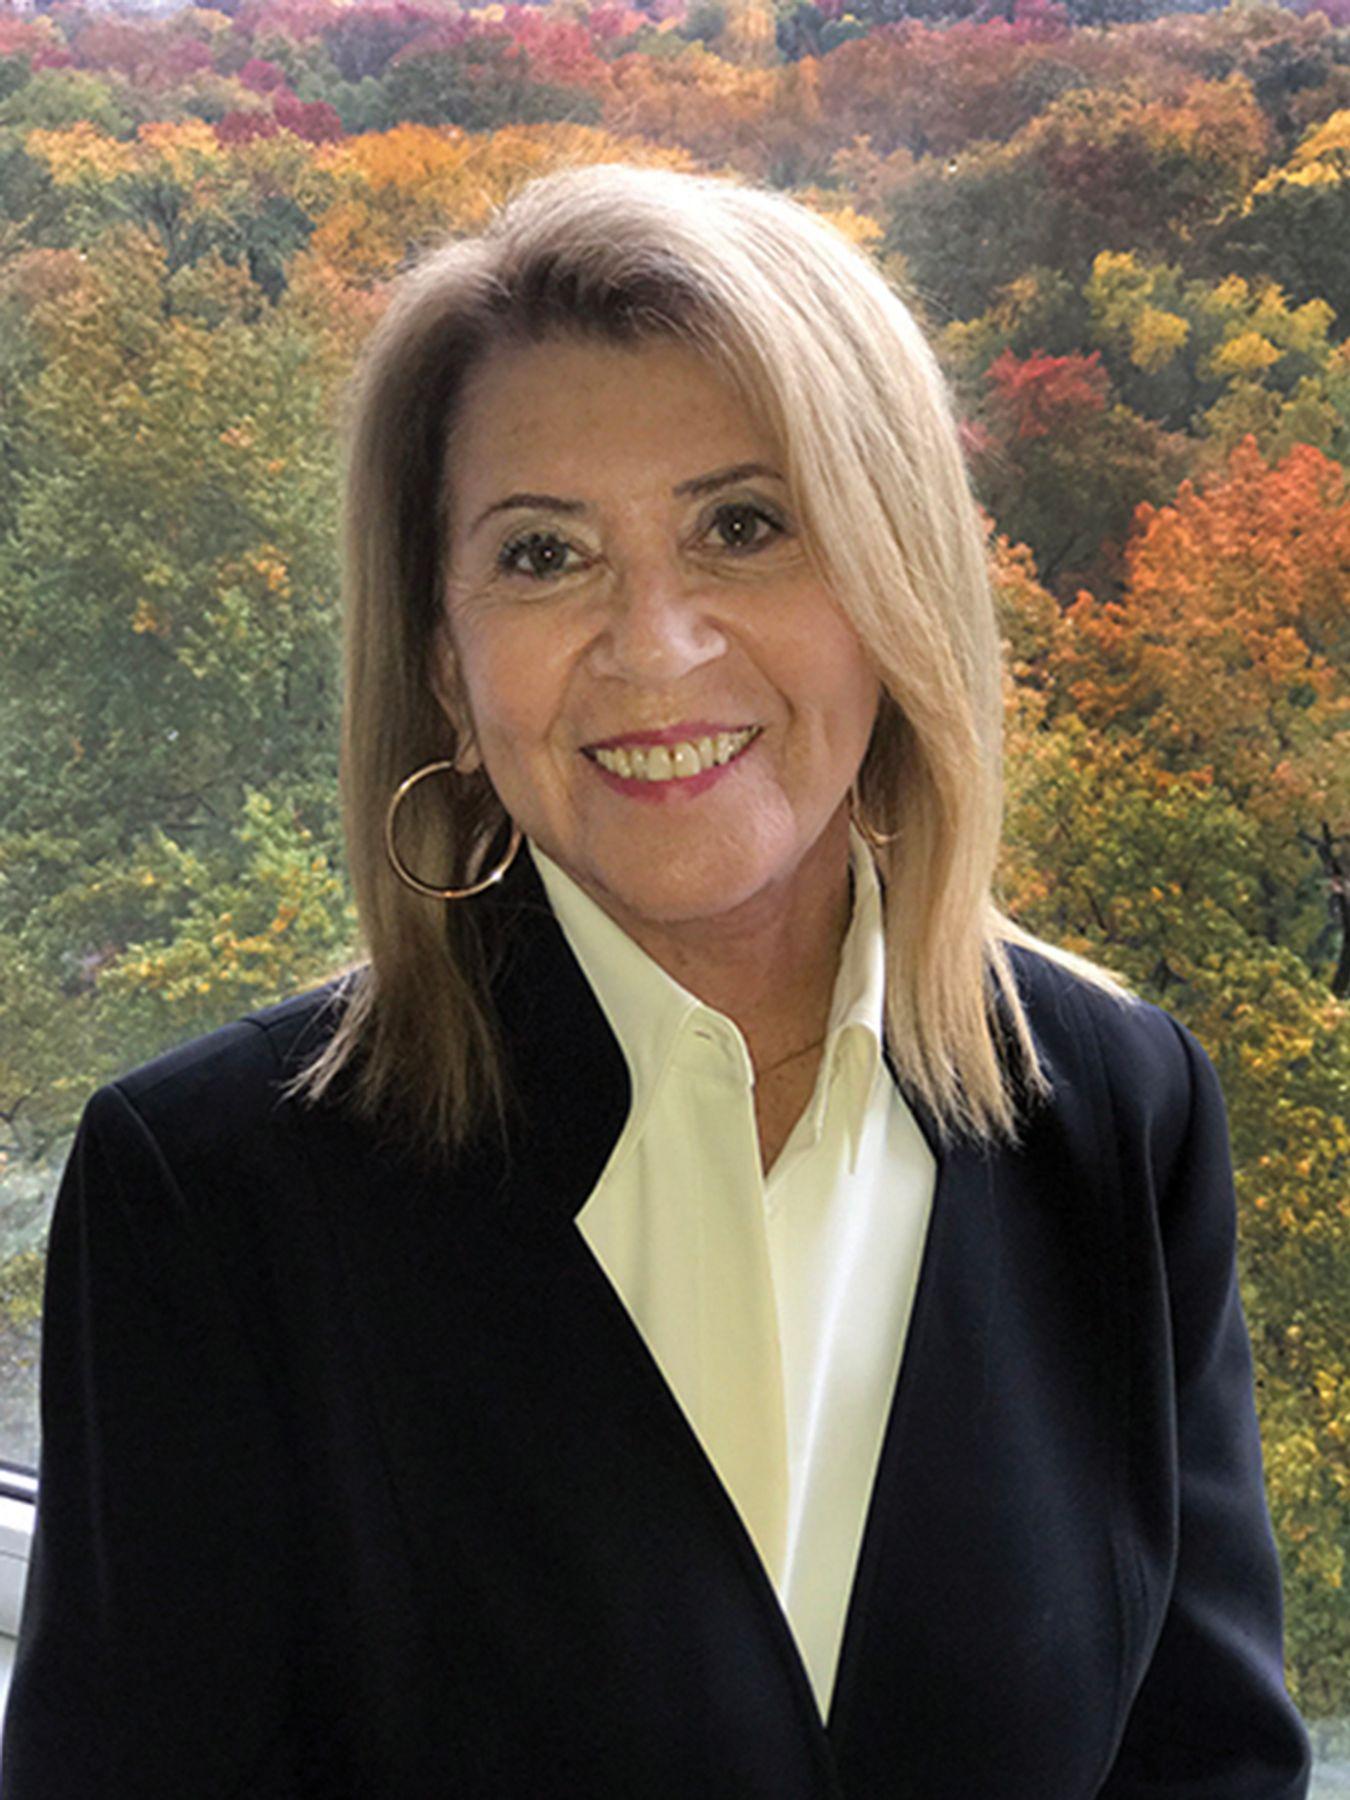 Esther Muller